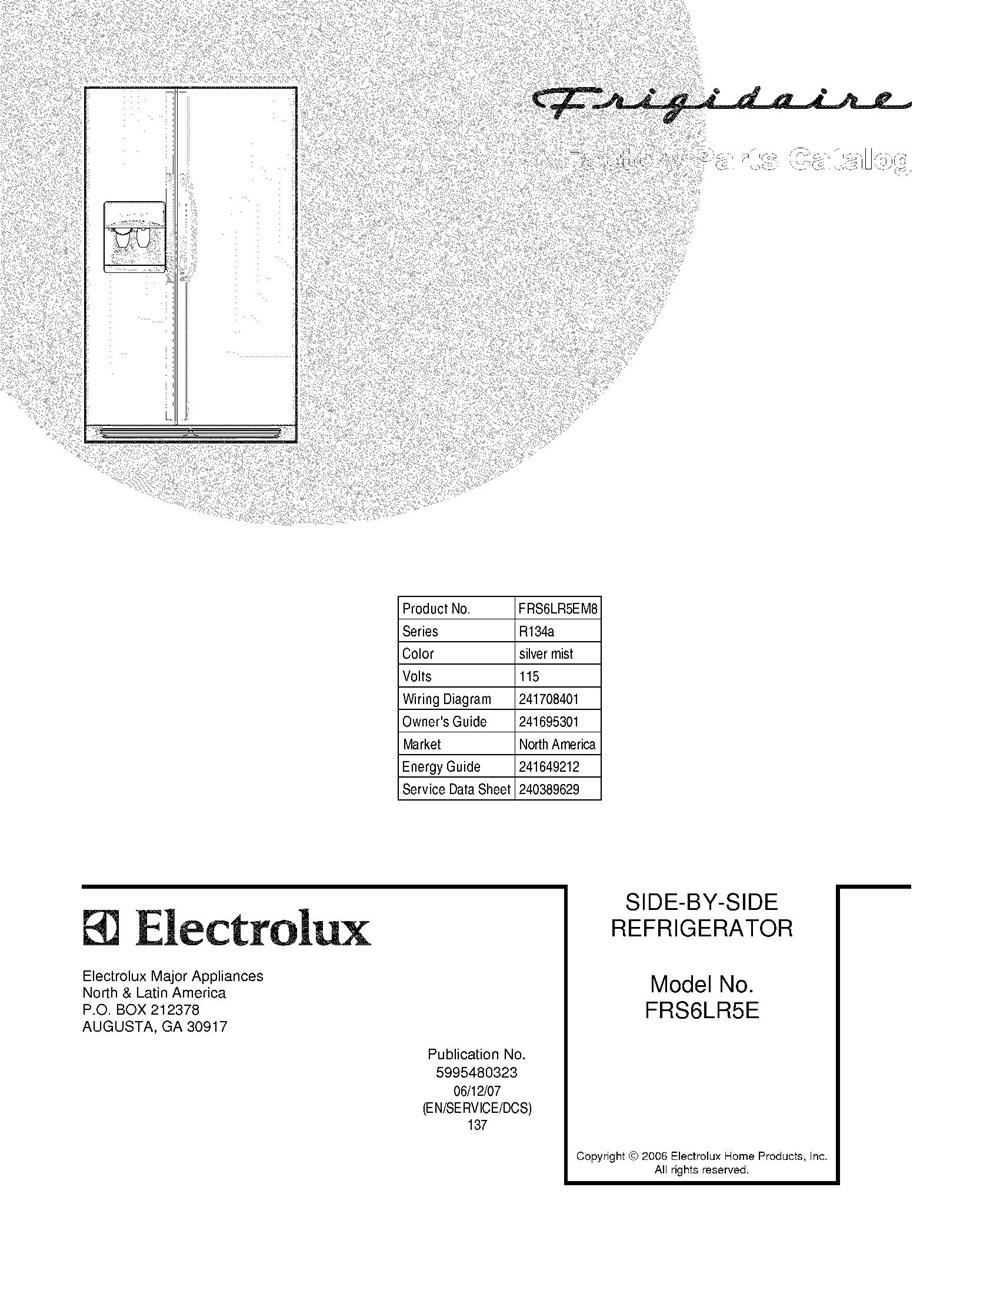 frs6lr5em8 frigidaire company appliance parts